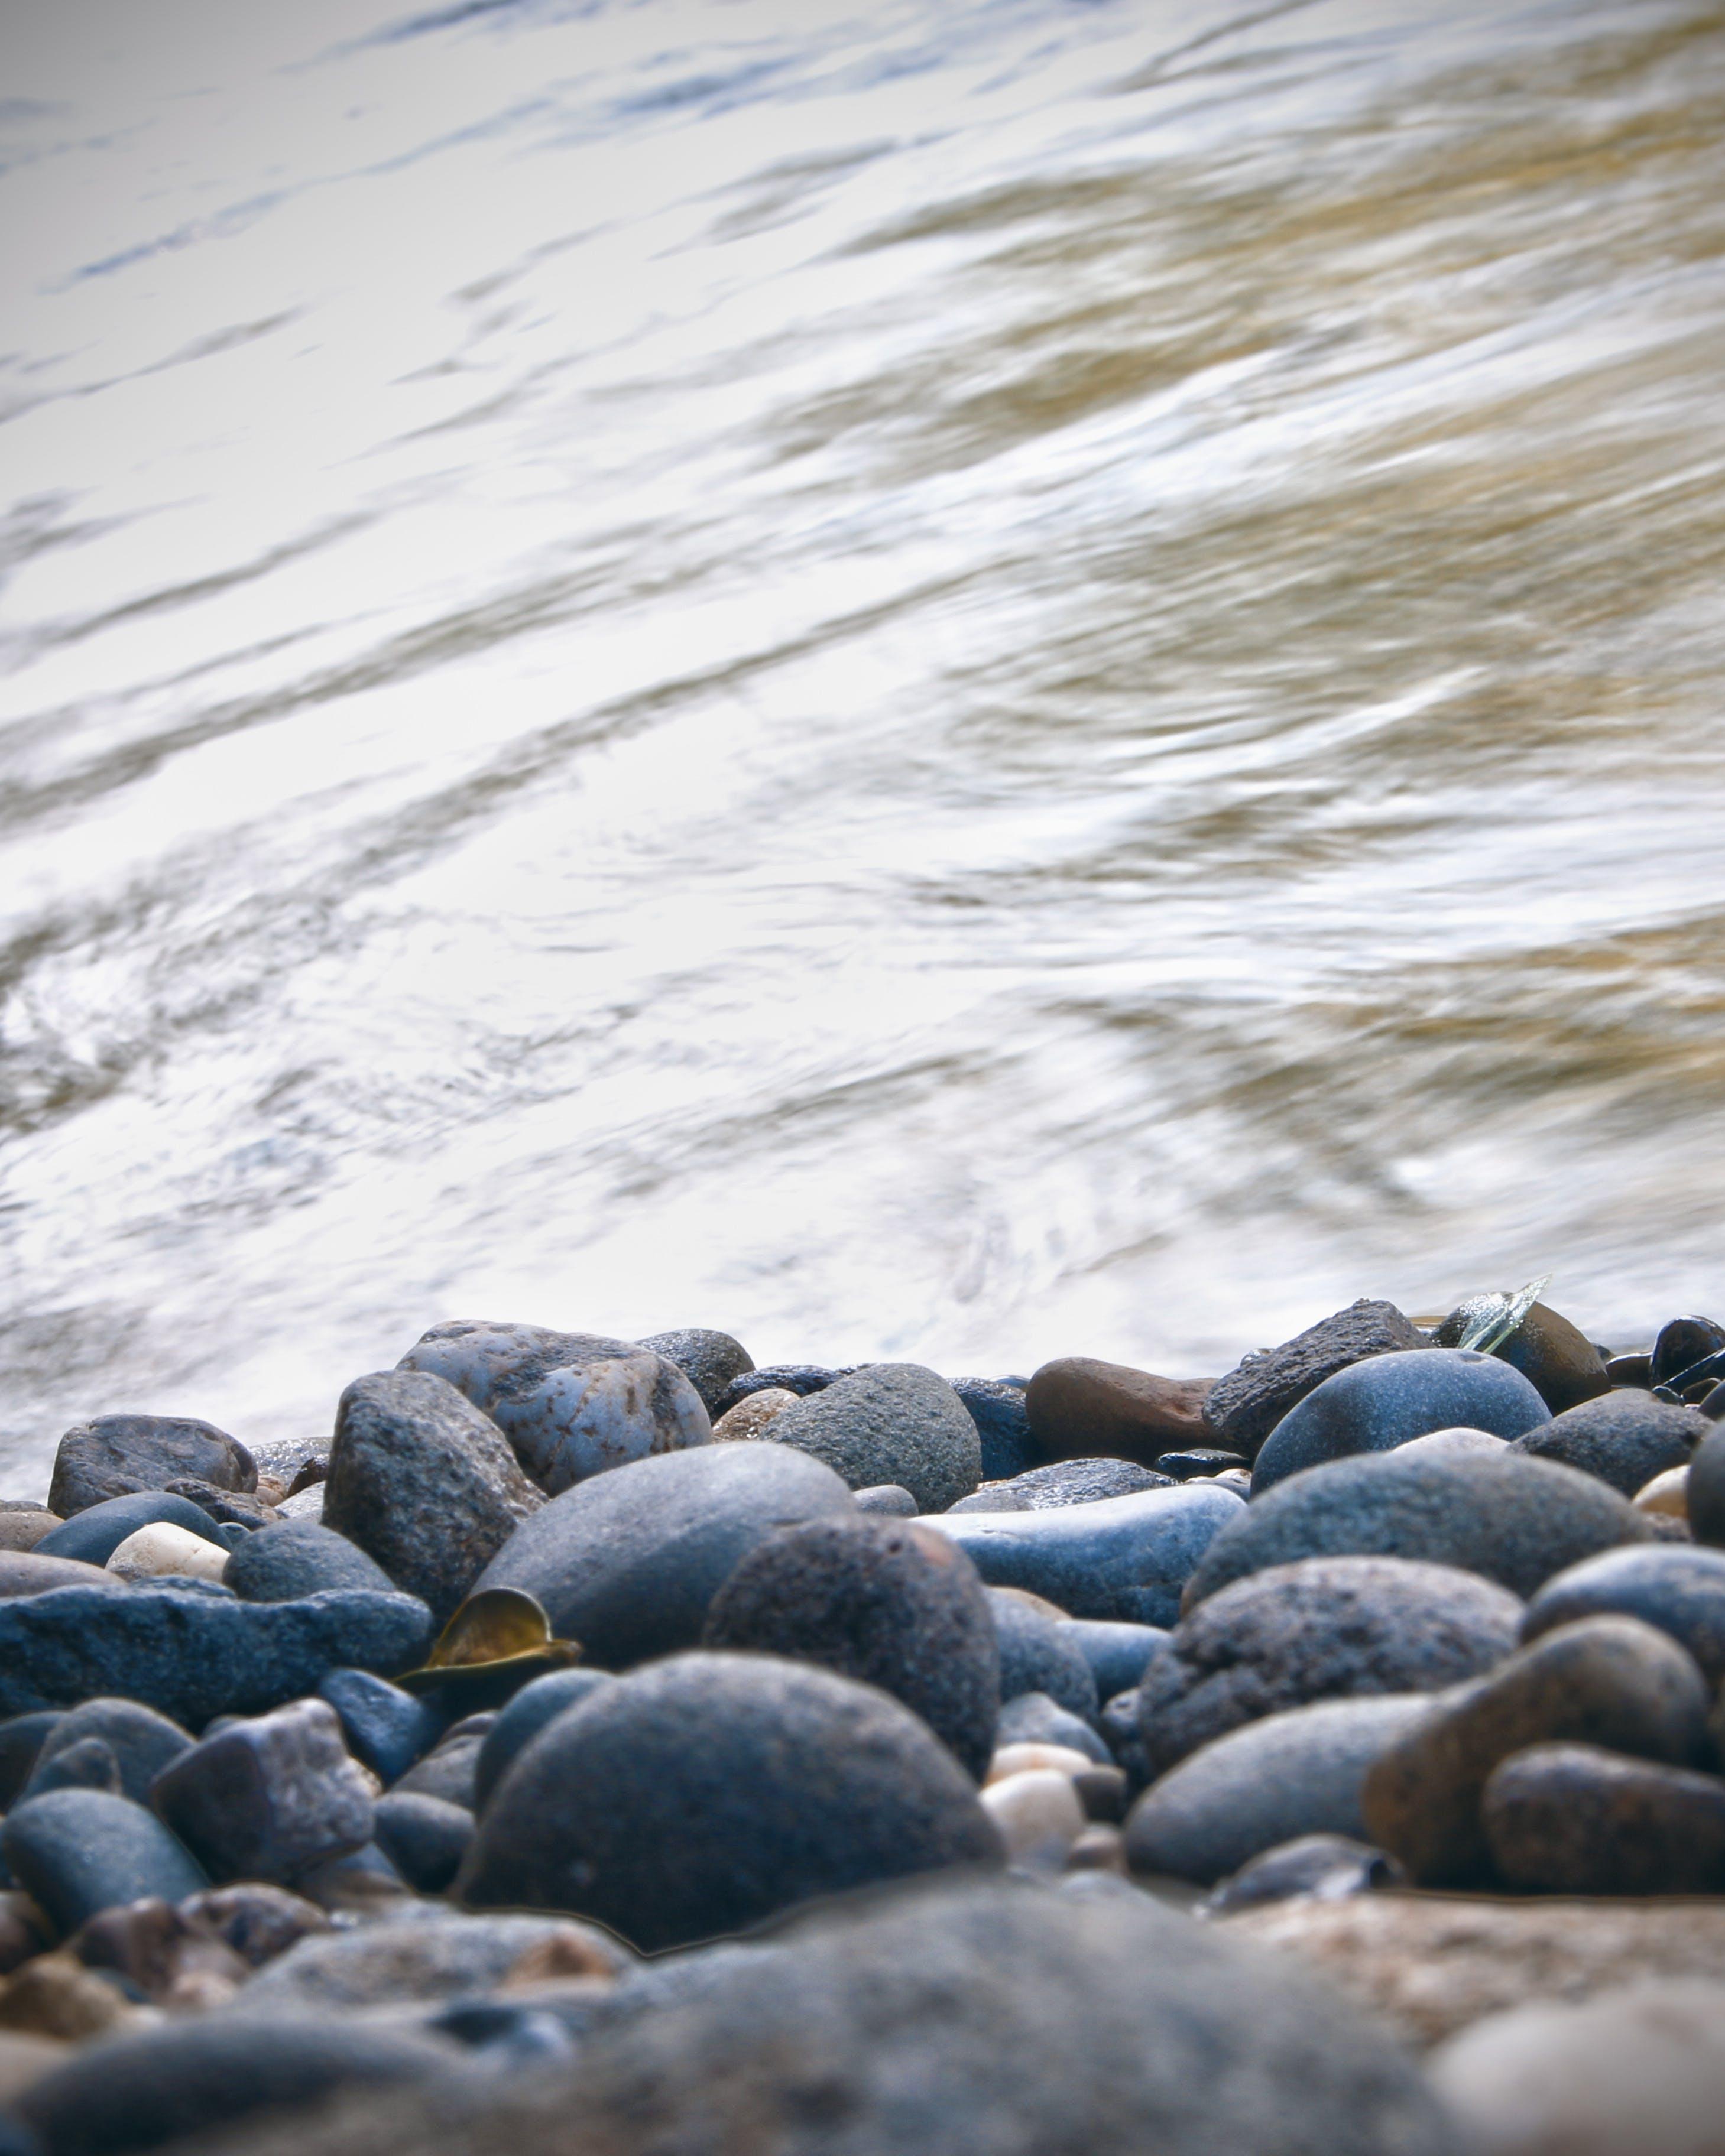 Free stock photo of river, rock, flow, brimstone